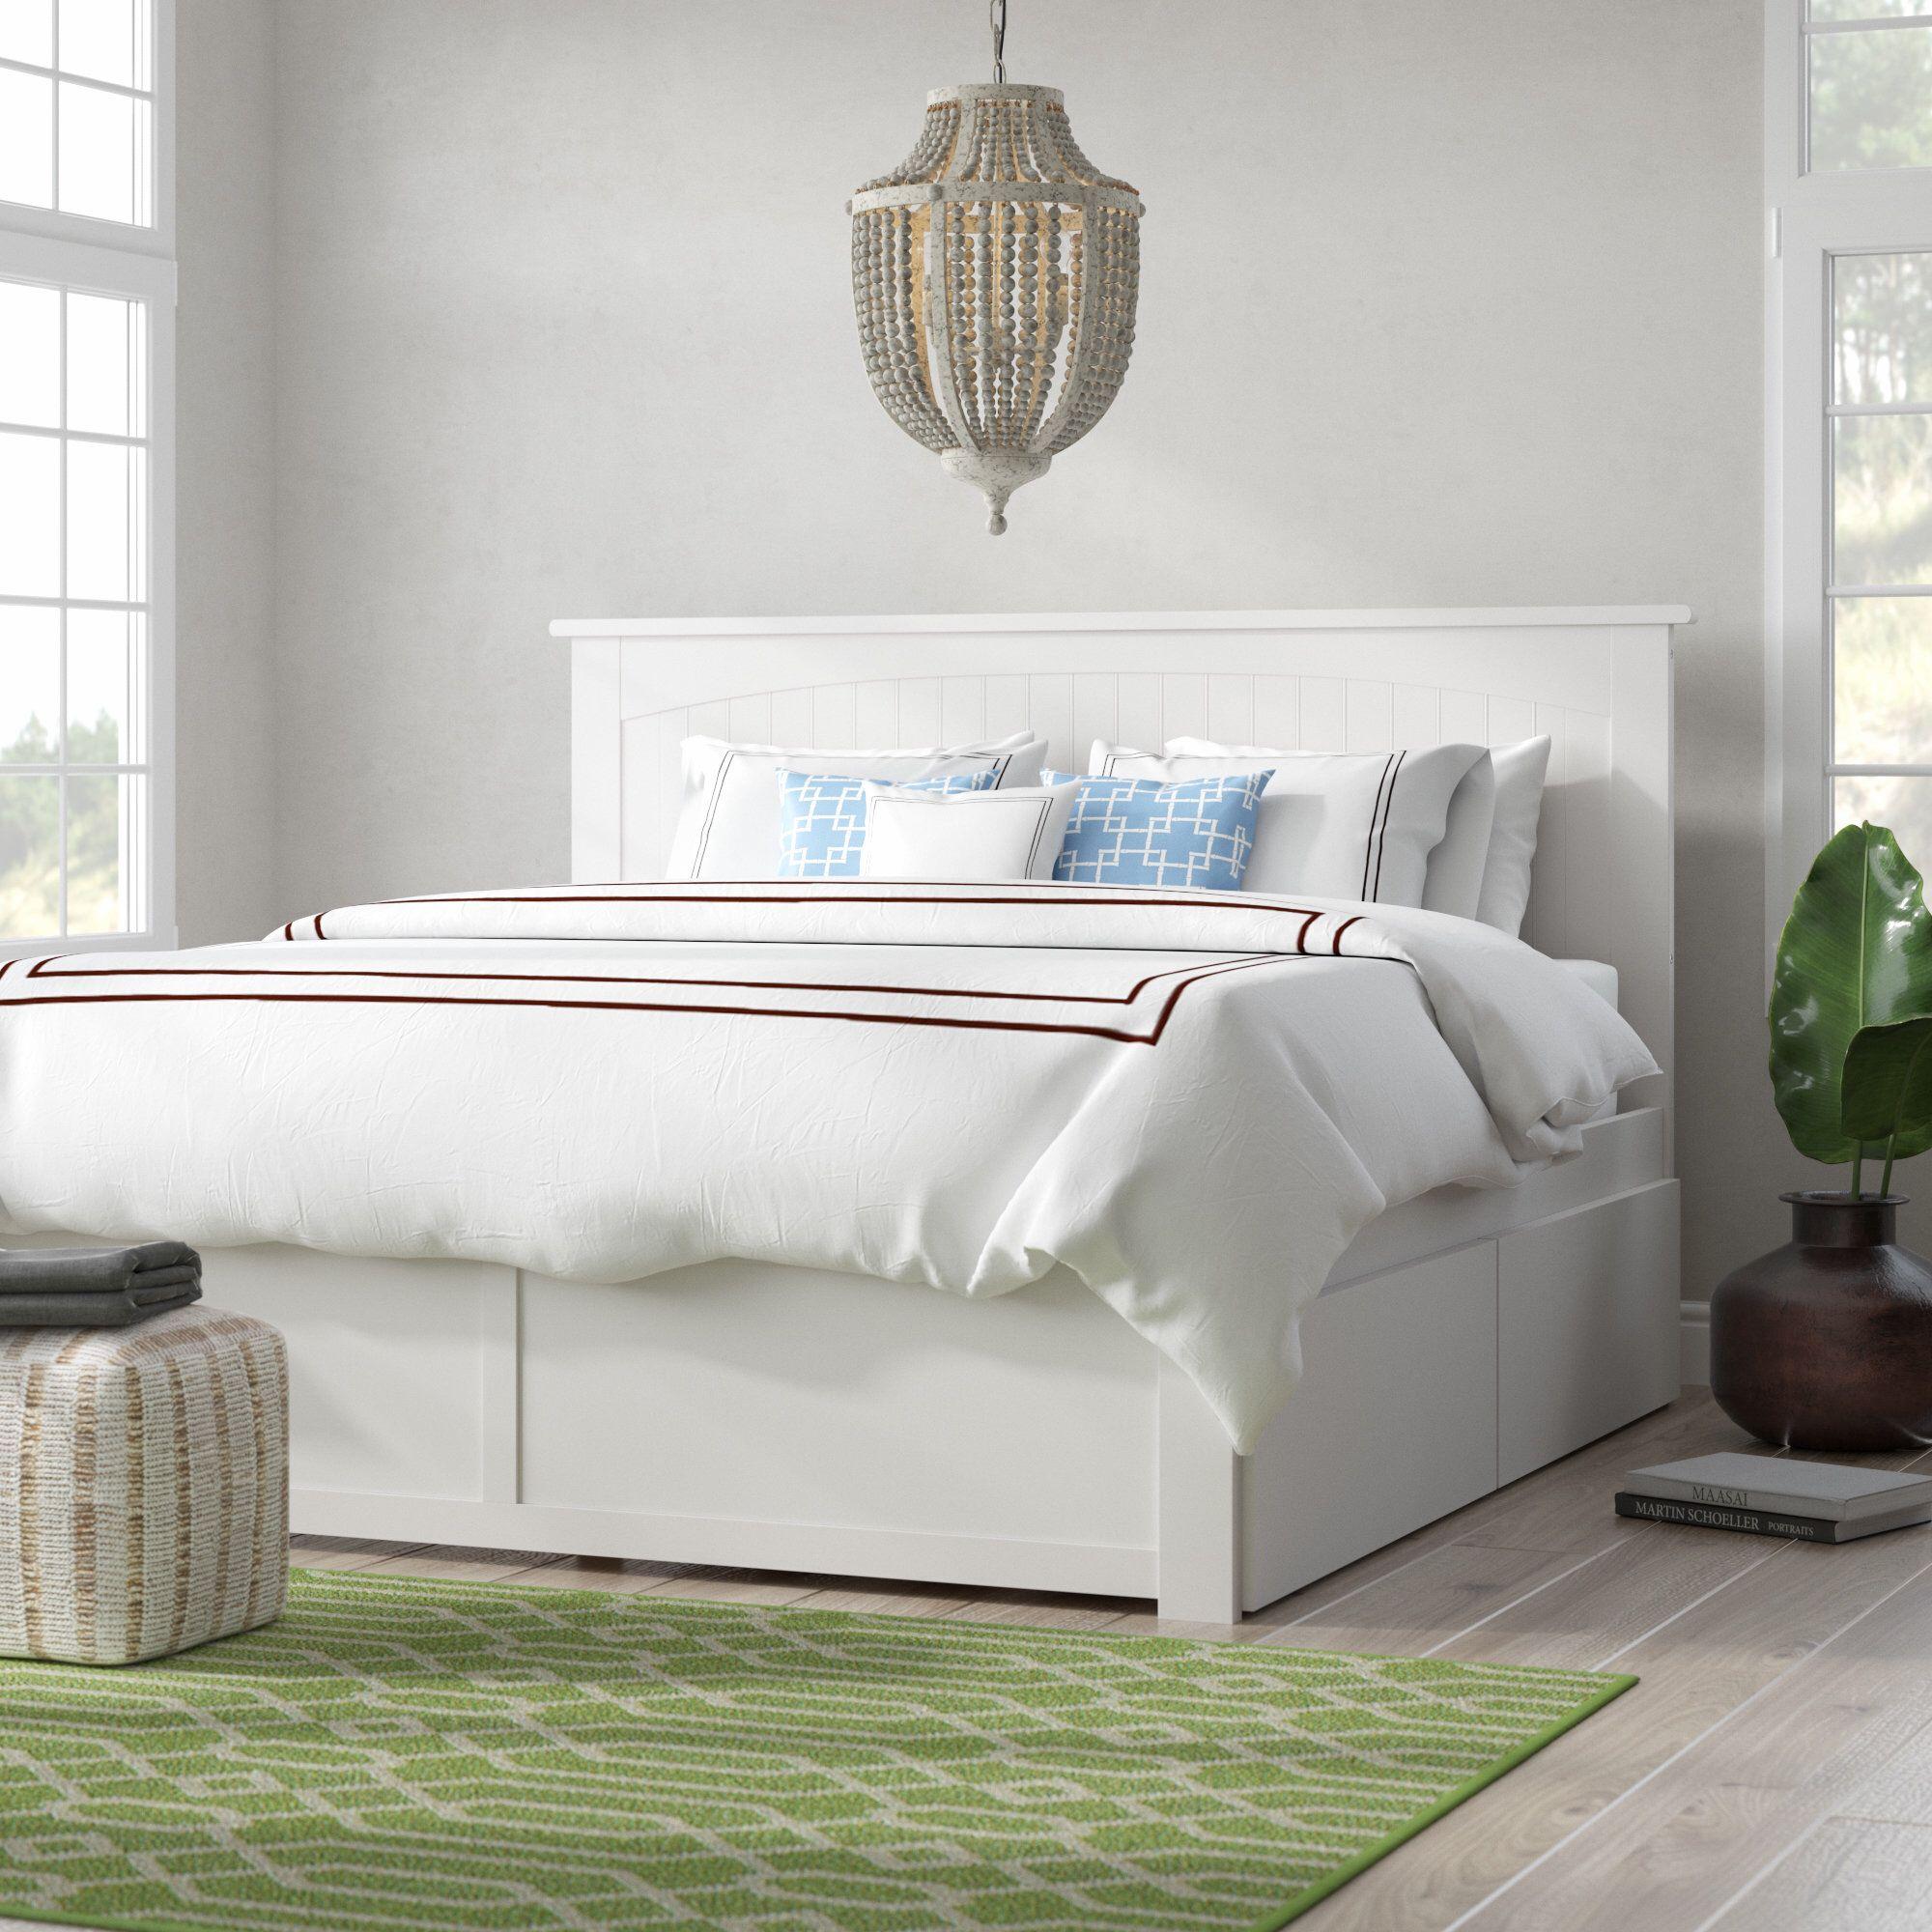 Graham King Storage Platform Bed Bed frame with drawers